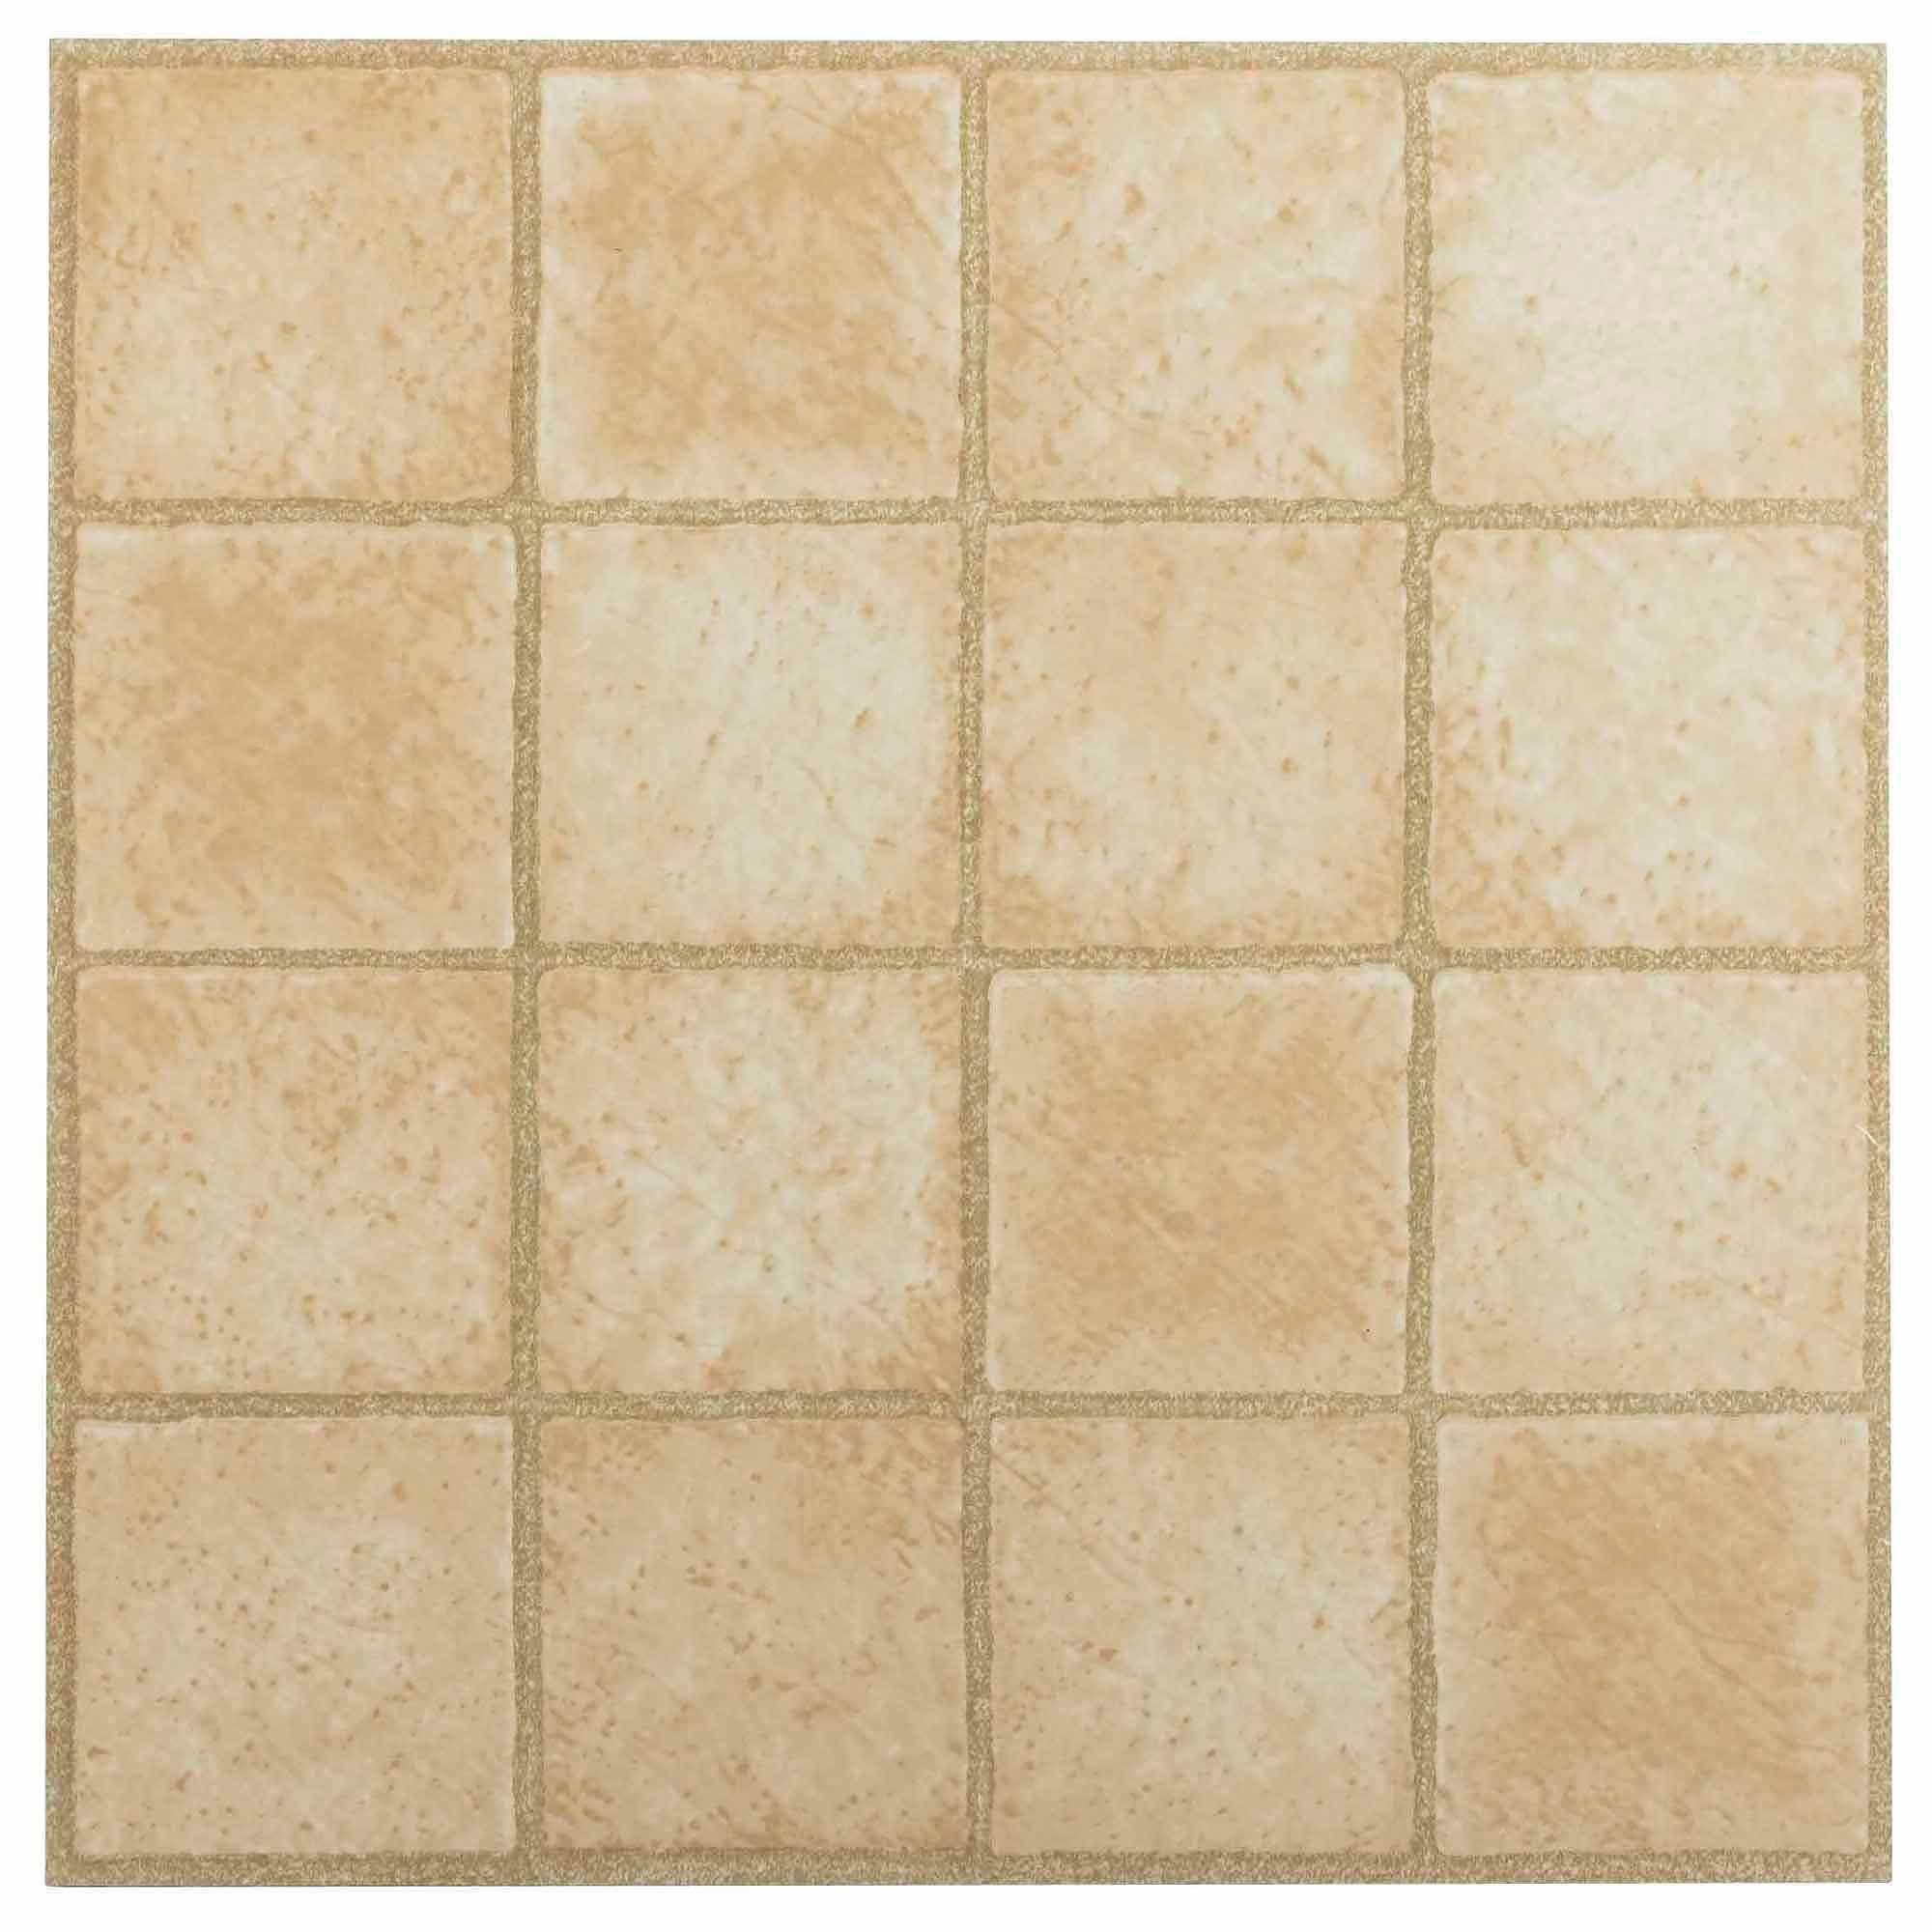 NEXUS 16 Square Sandstone 12x12 Self Adhesive Vinyl Floor Tile - 20 Tiles/20 Sq.Ft.